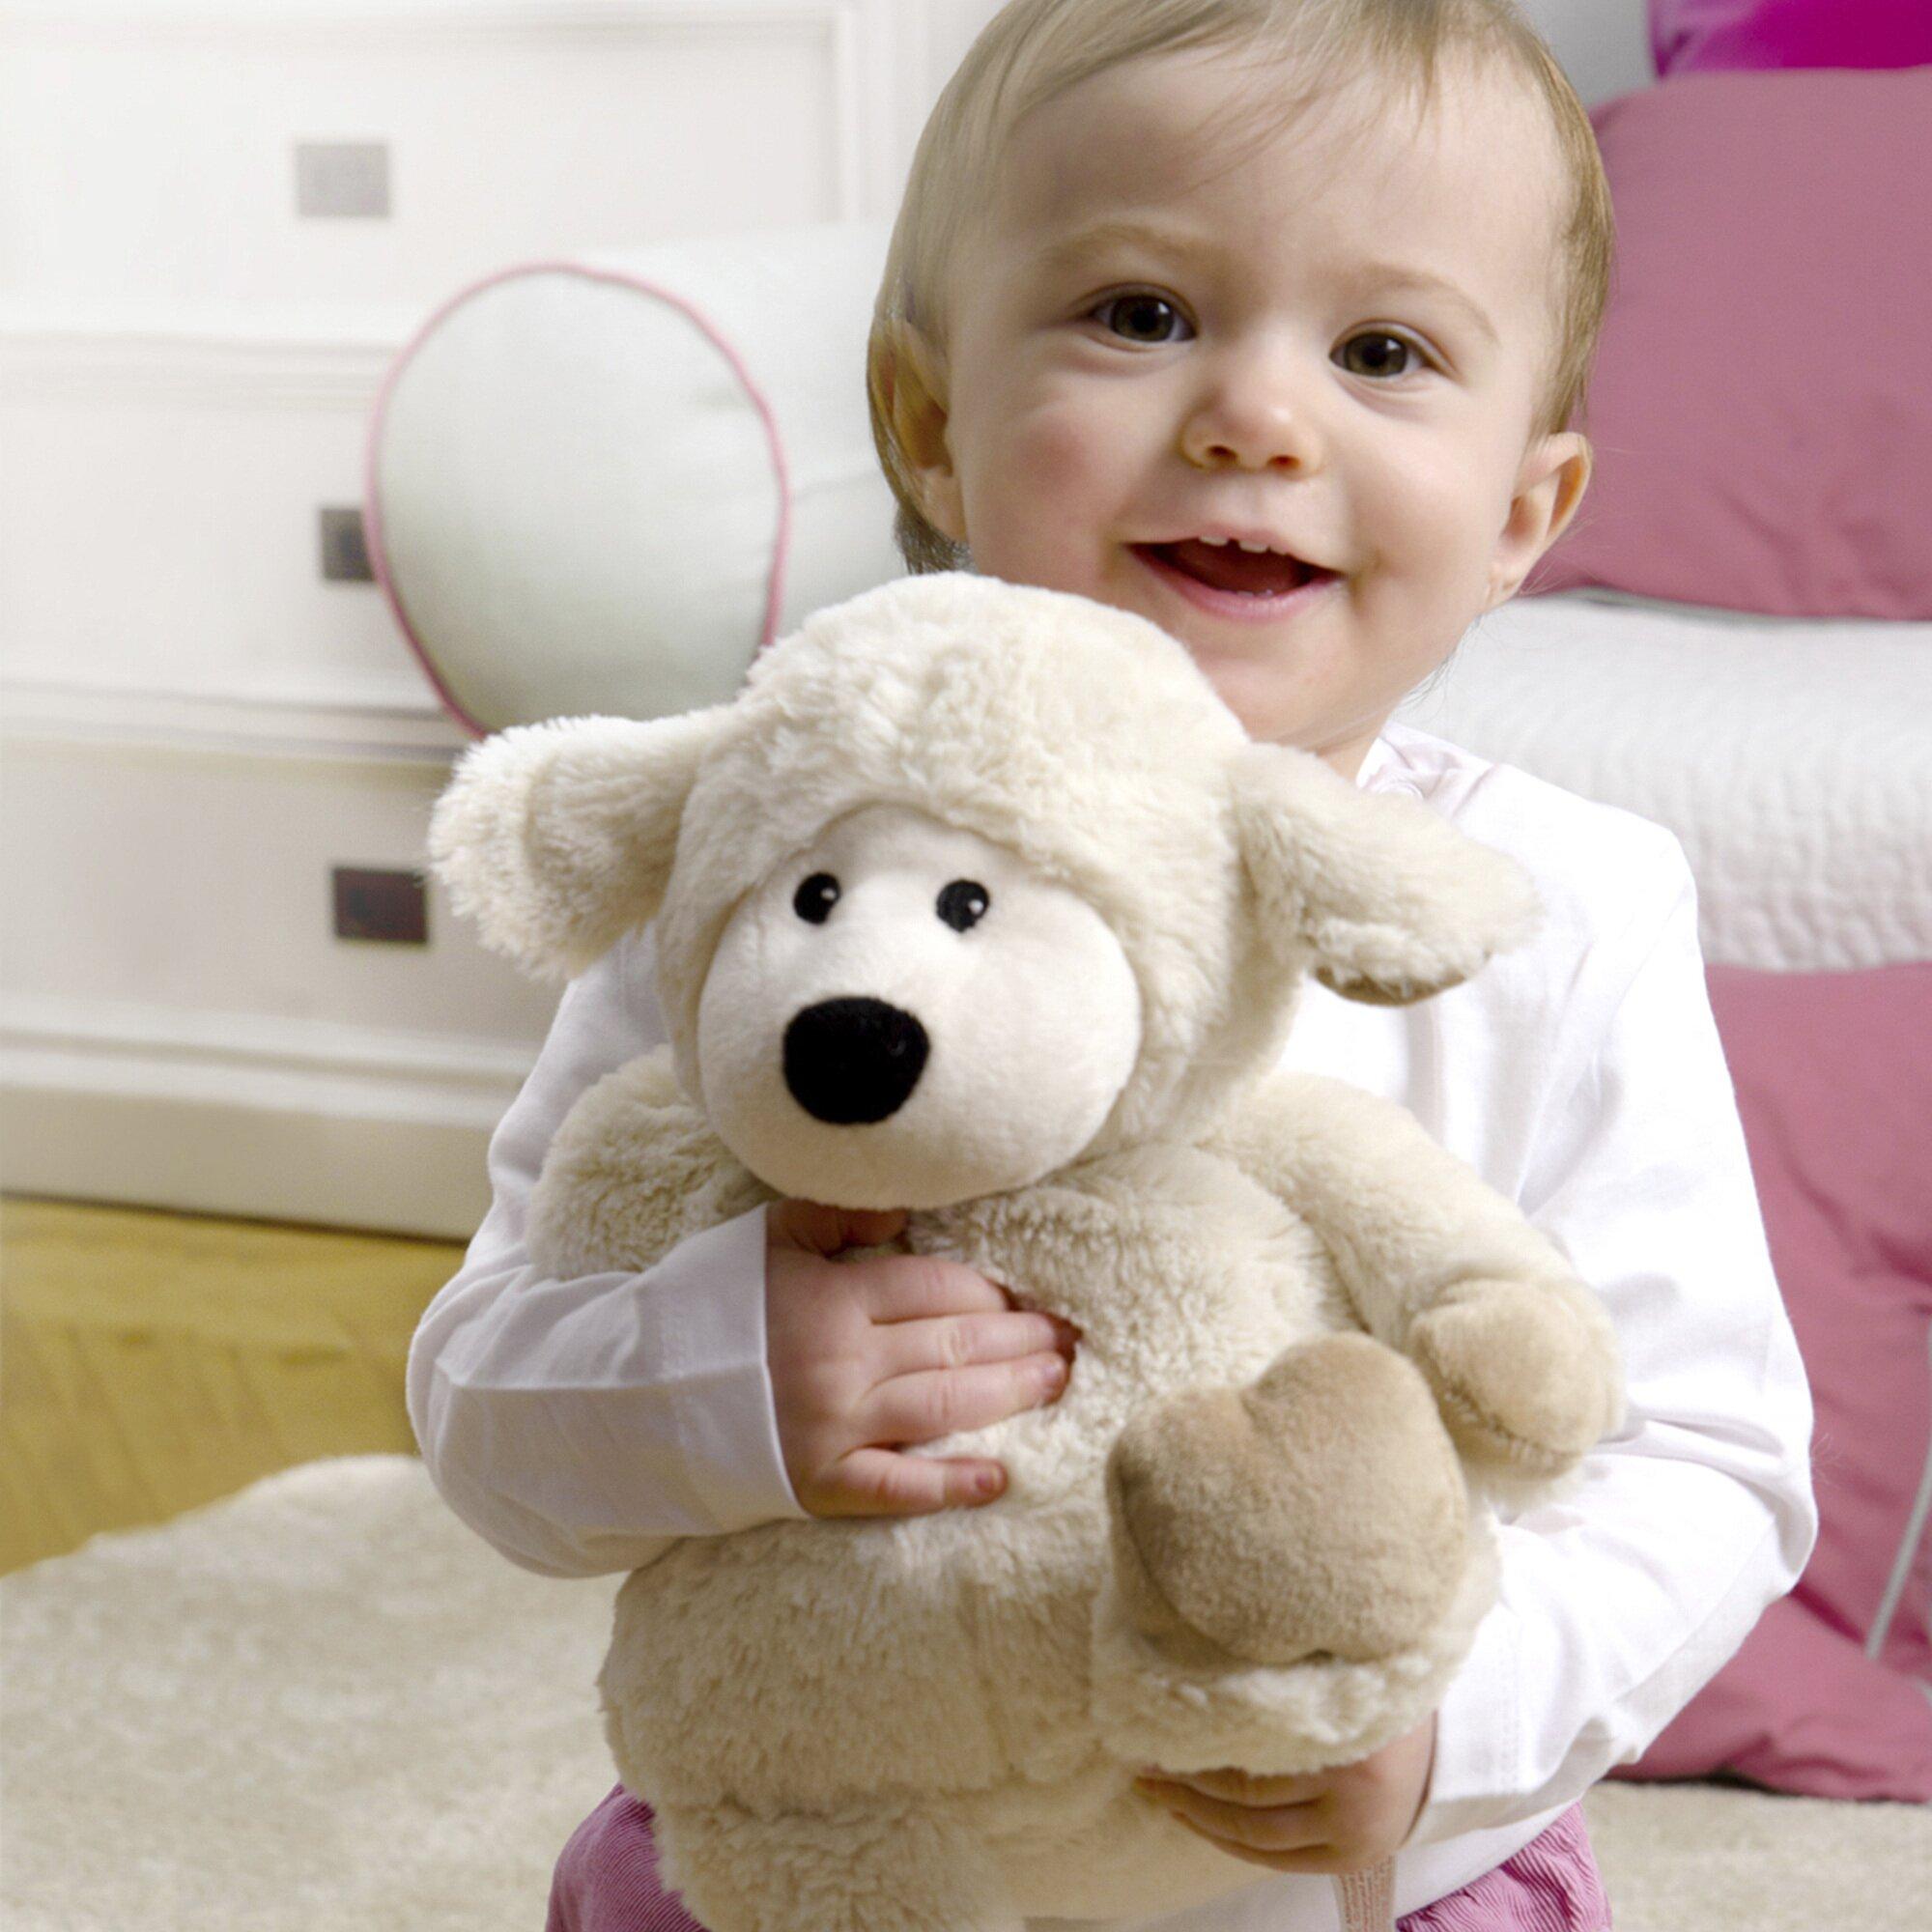 warmies-warmekissen-mit-lavendel-kornfullung-beddy-bears-schaf, 15.99 EUR @ babywalz-de